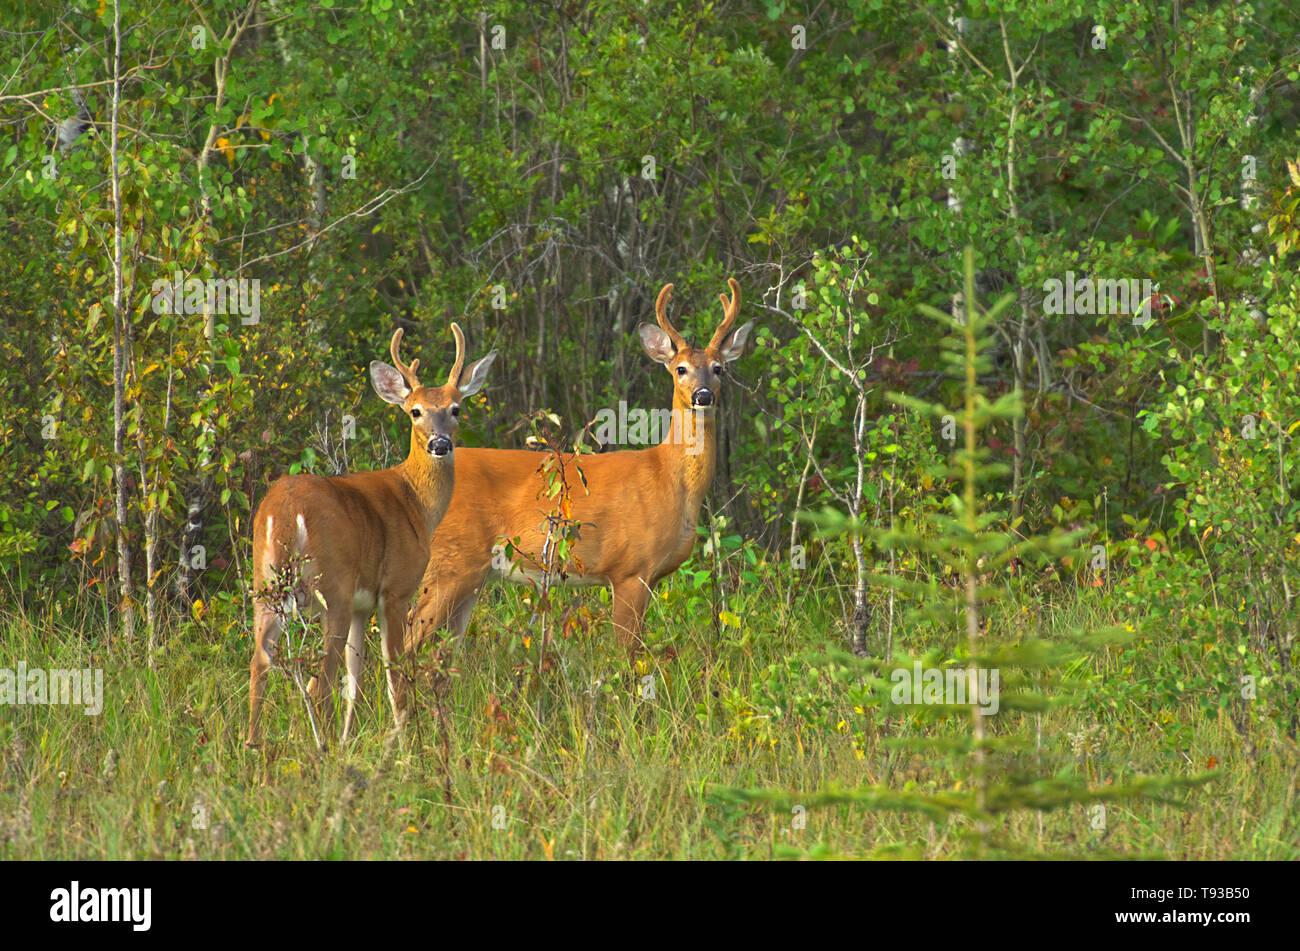 White-tailed deer (Odocoileus virginianus) bucks at edge of aspen parkland forest Fairford River, Canada - Stock Image